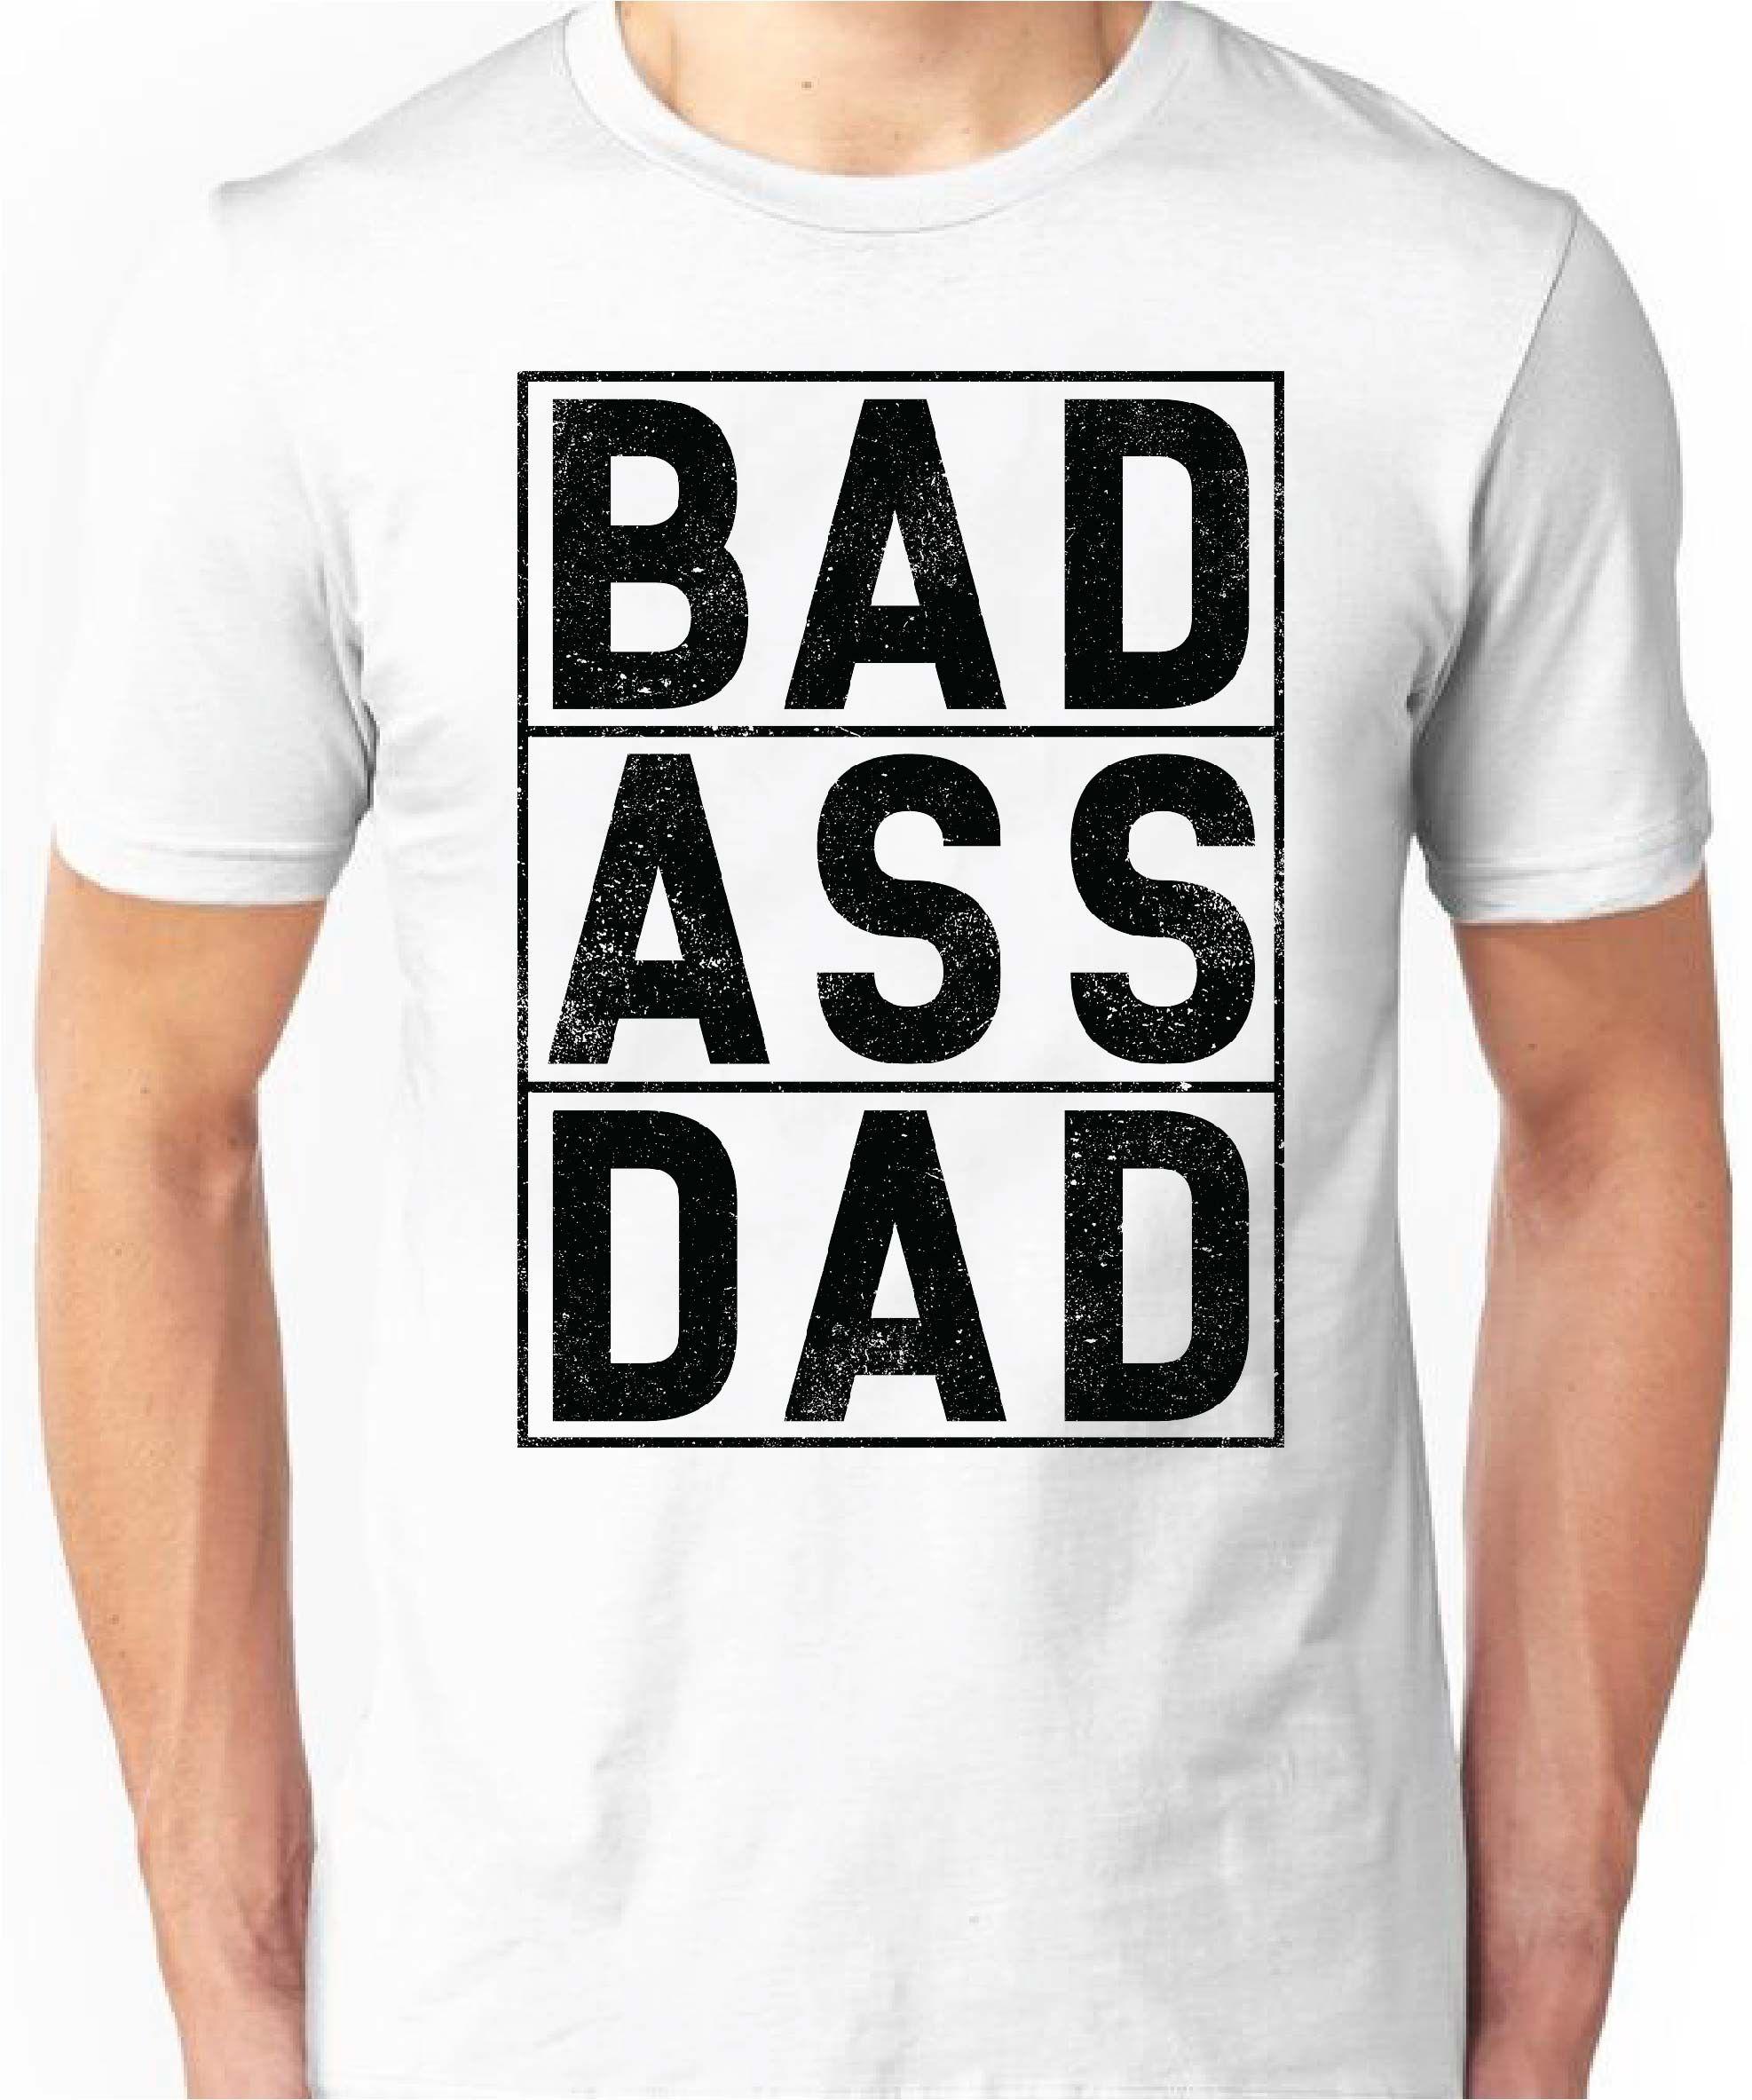 861e8cd1 Bad ass dad shirts | Fathers day ideas! | Dad, son shirts, DIY ...